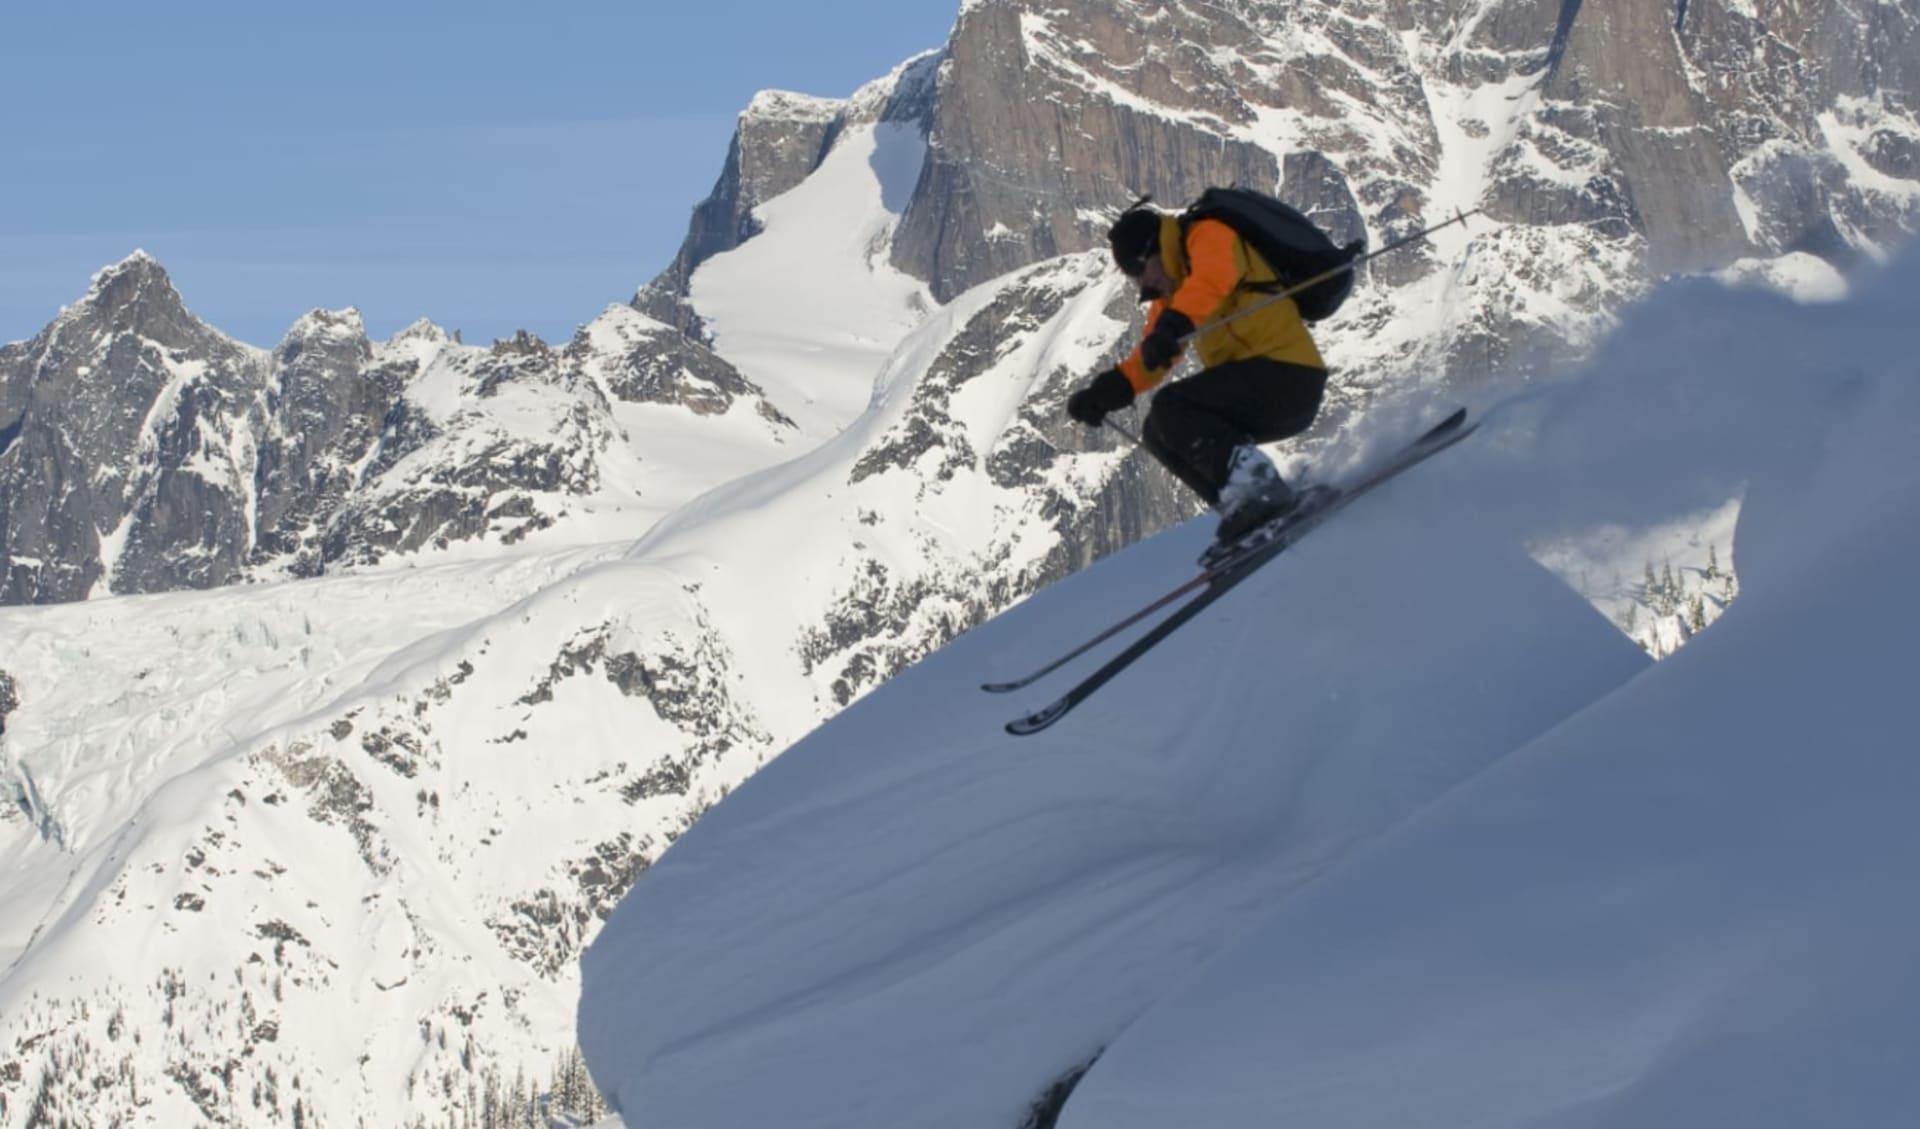 Adamants 7 Tage (CMH) ab Calgary: Kanada - CMH - Adamants - Skifahrer im Sprung